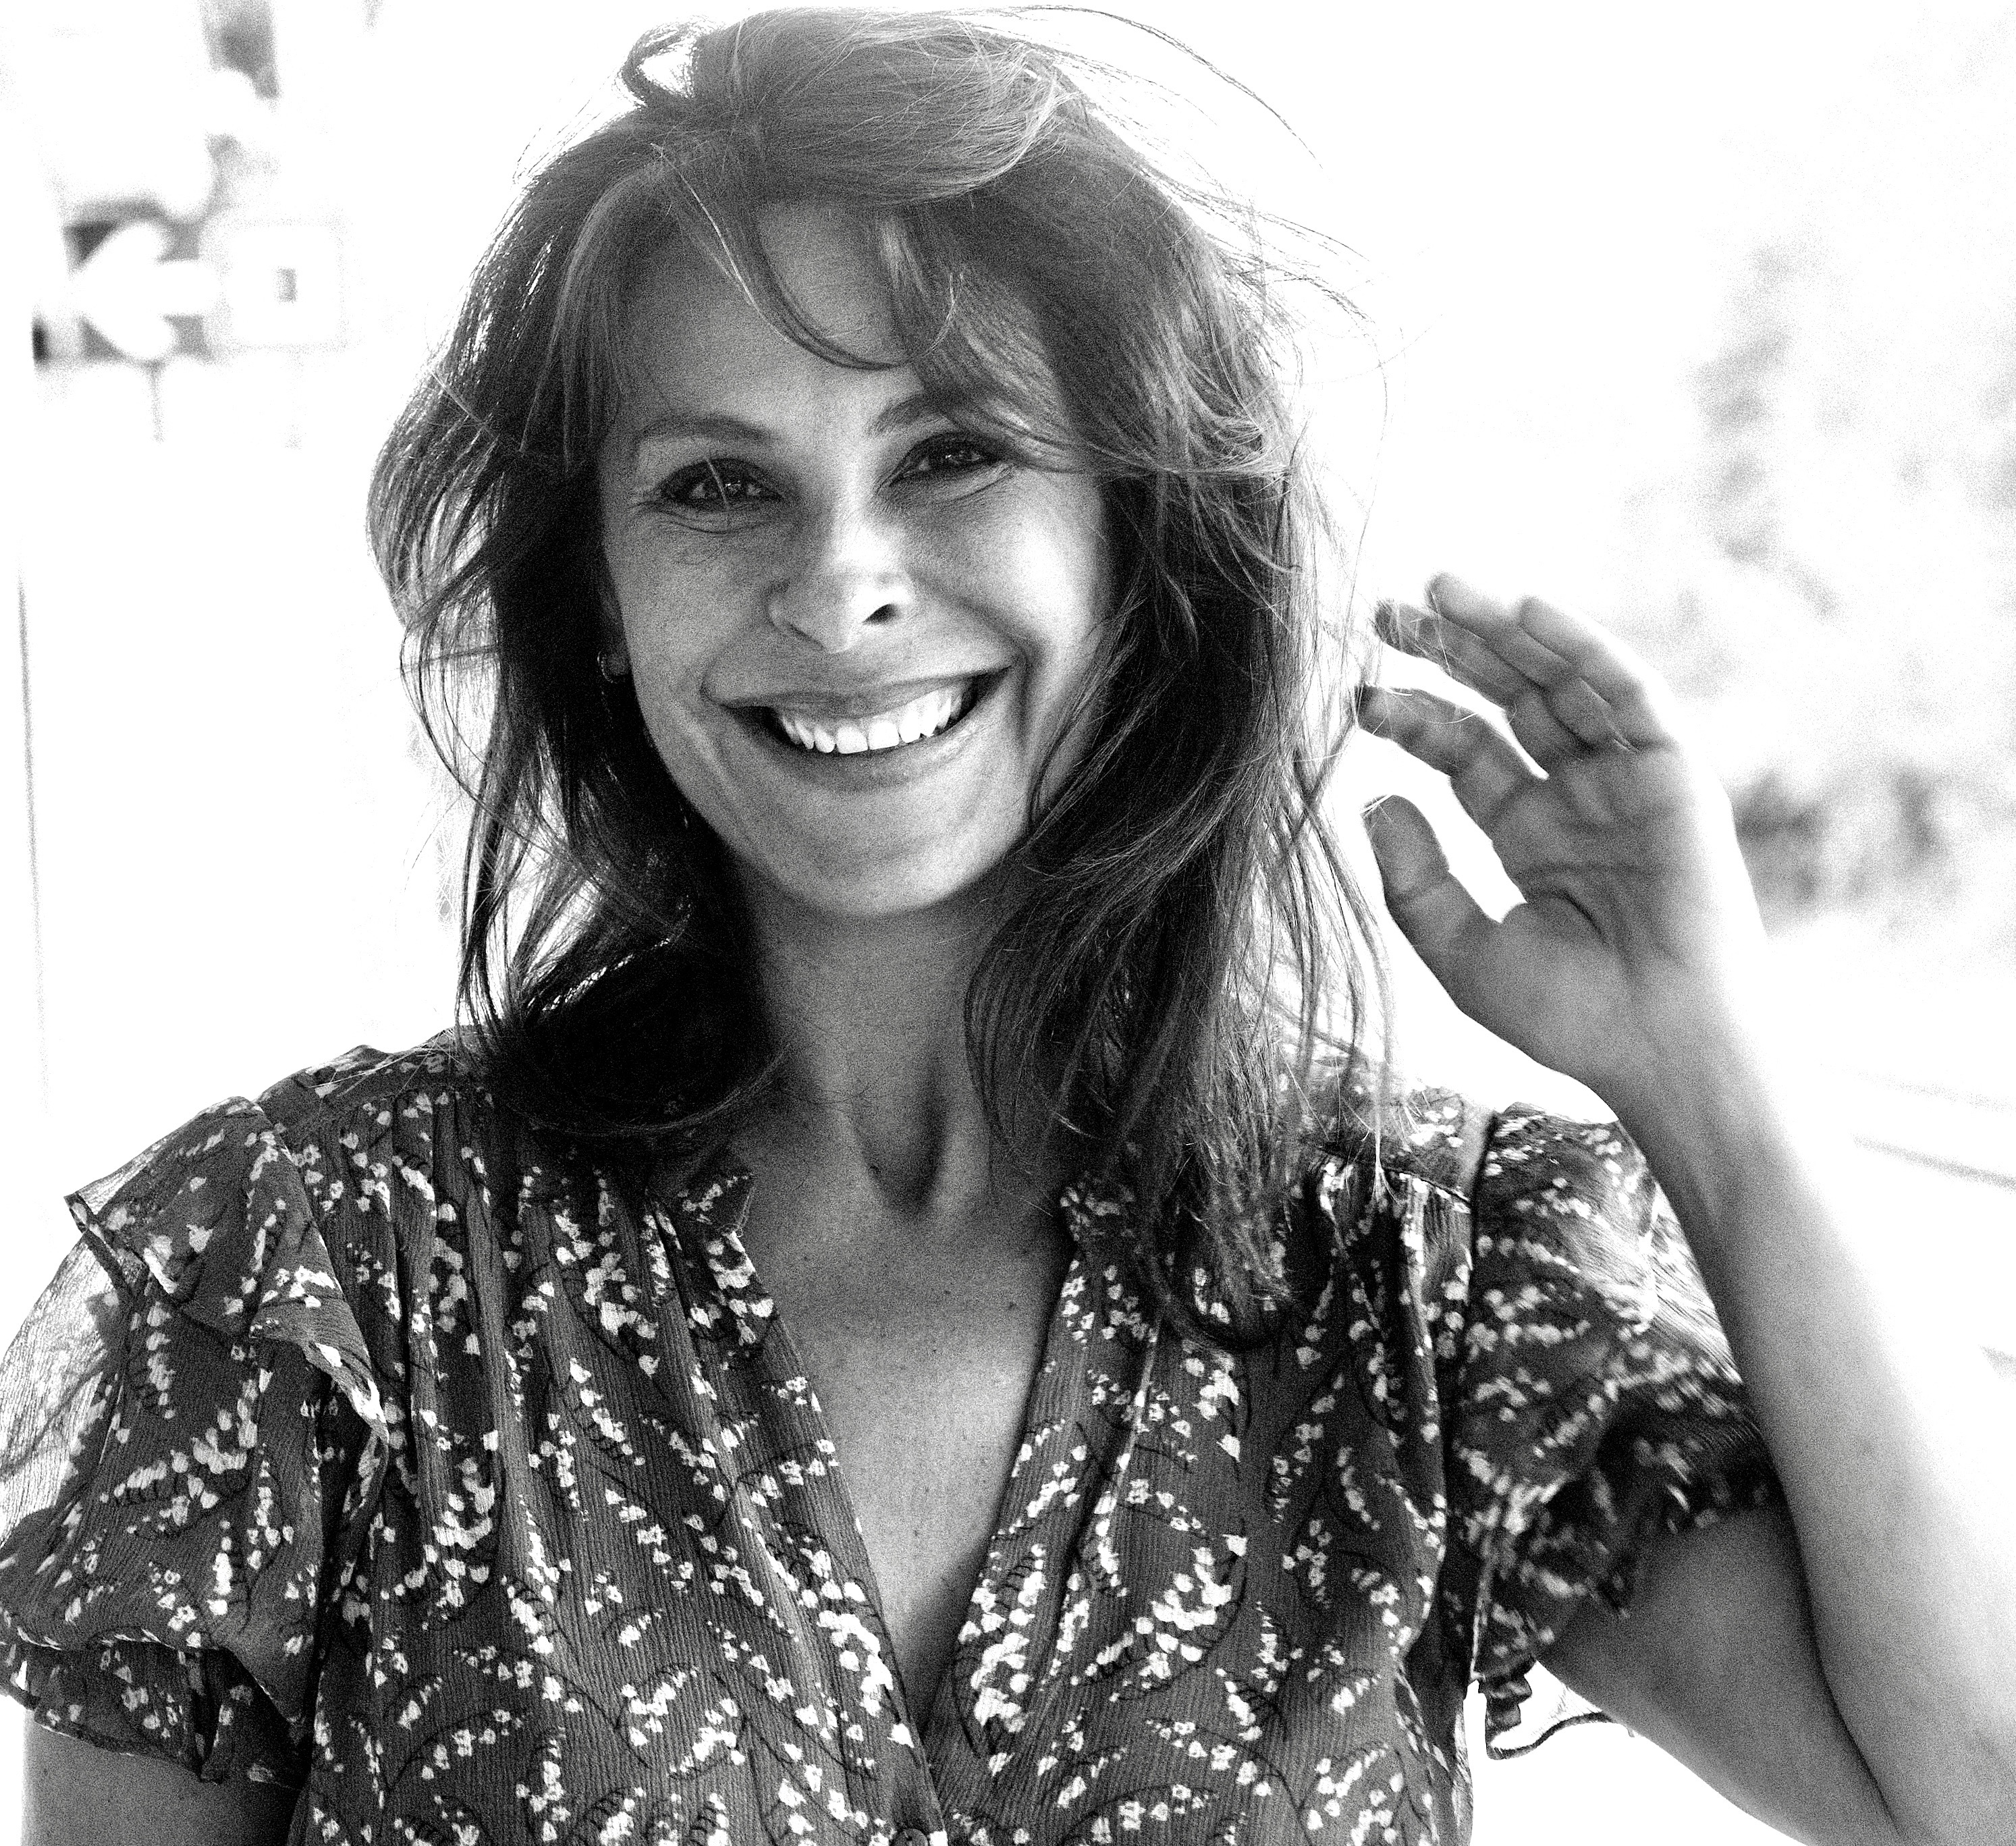 Tania Garbarski (c) Xavier Claeys